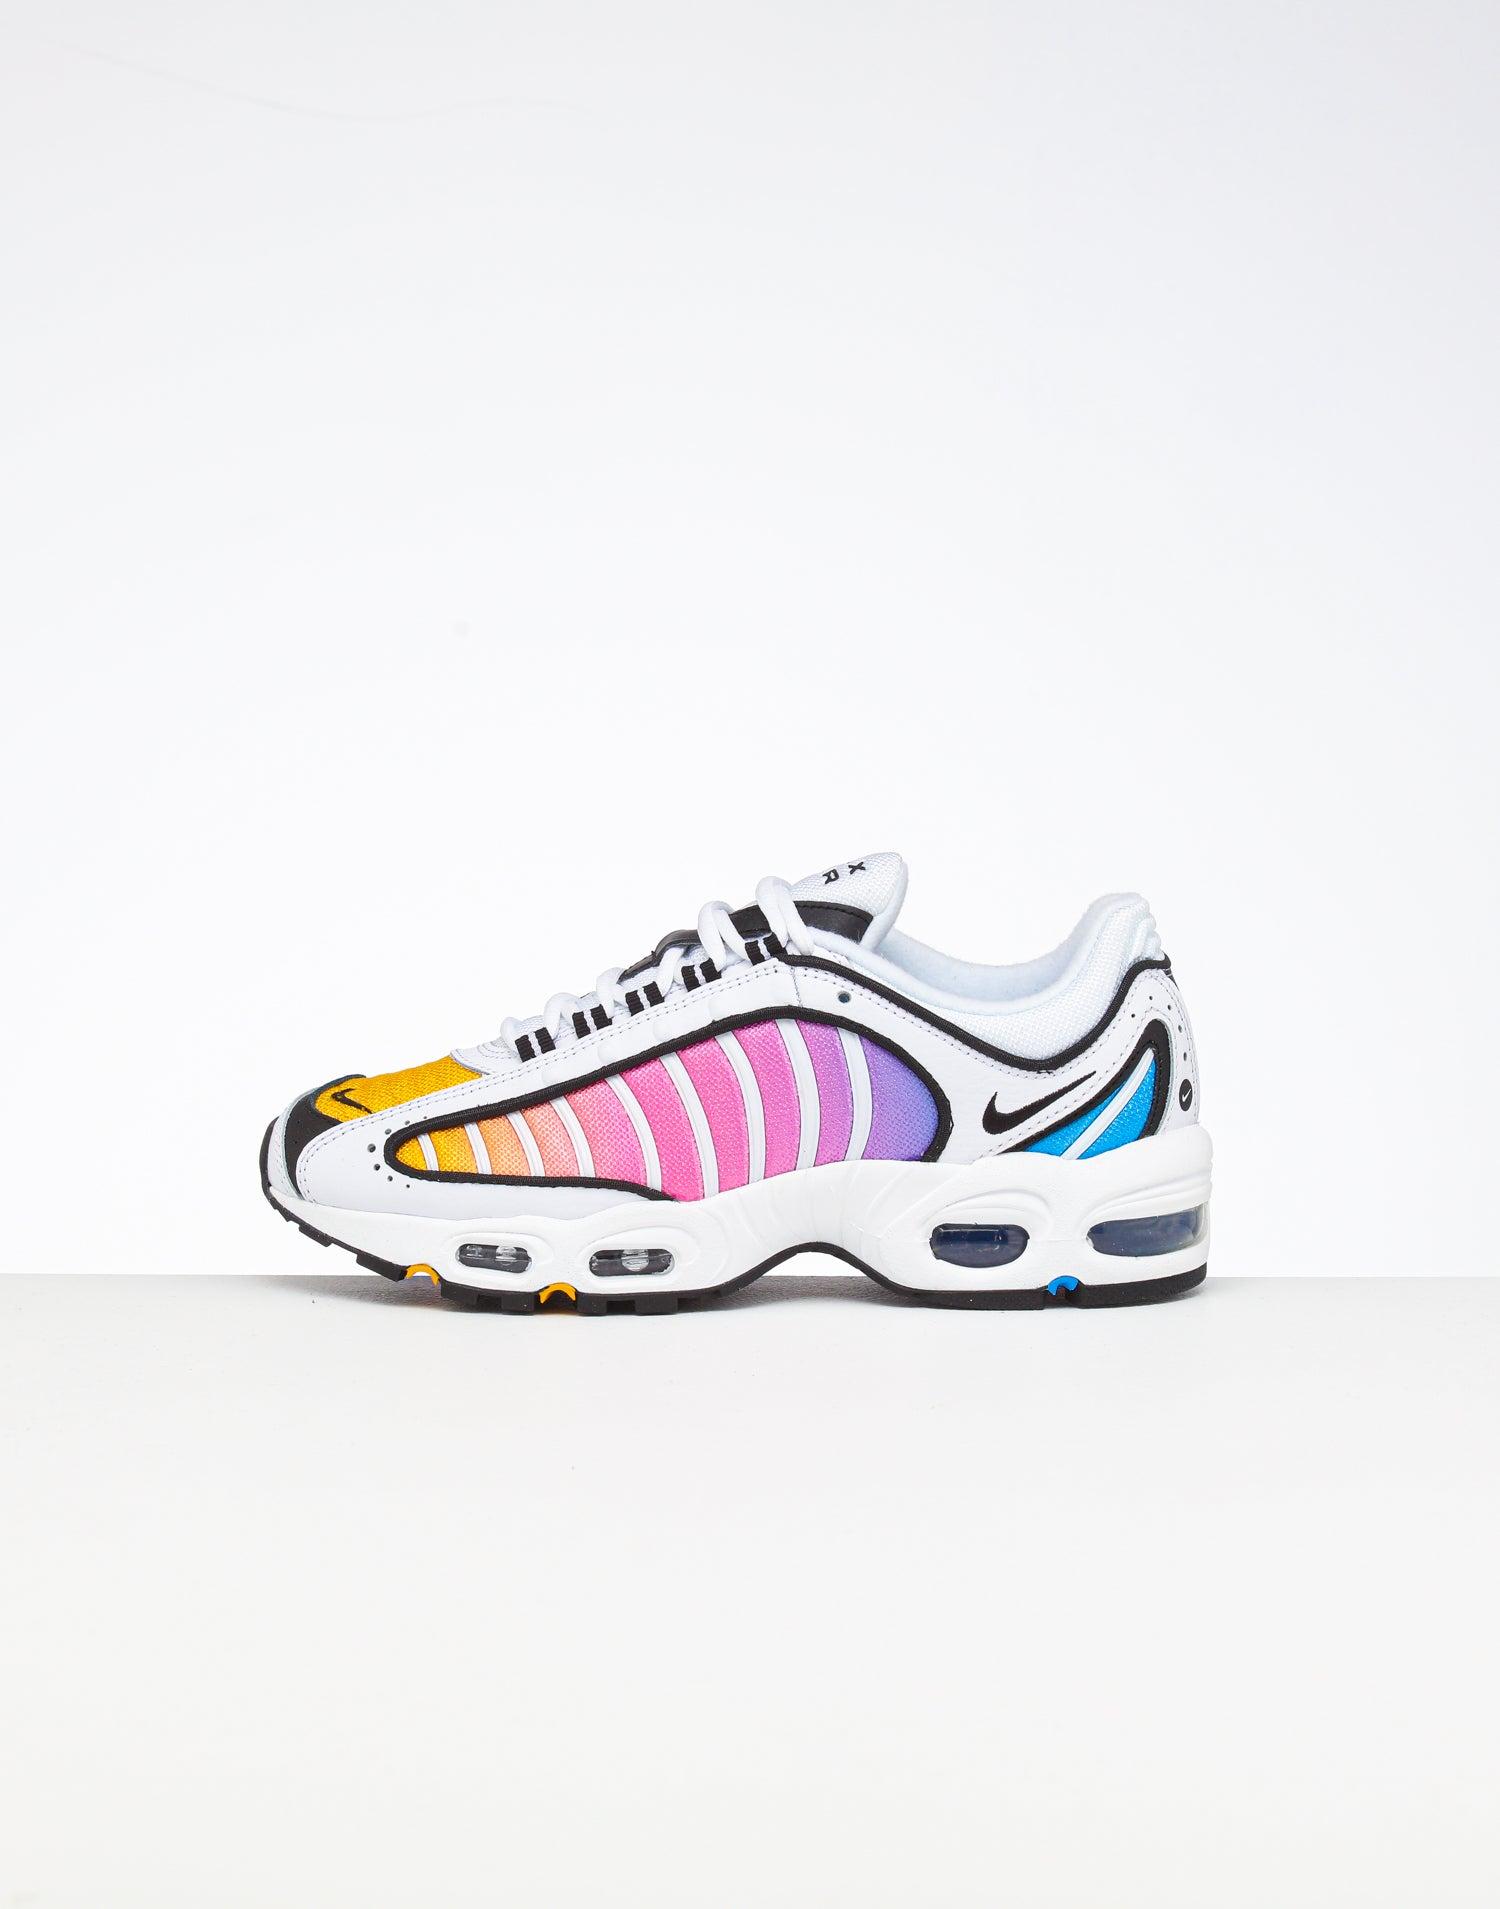 Nike Women's Air Max Tailwind IV White